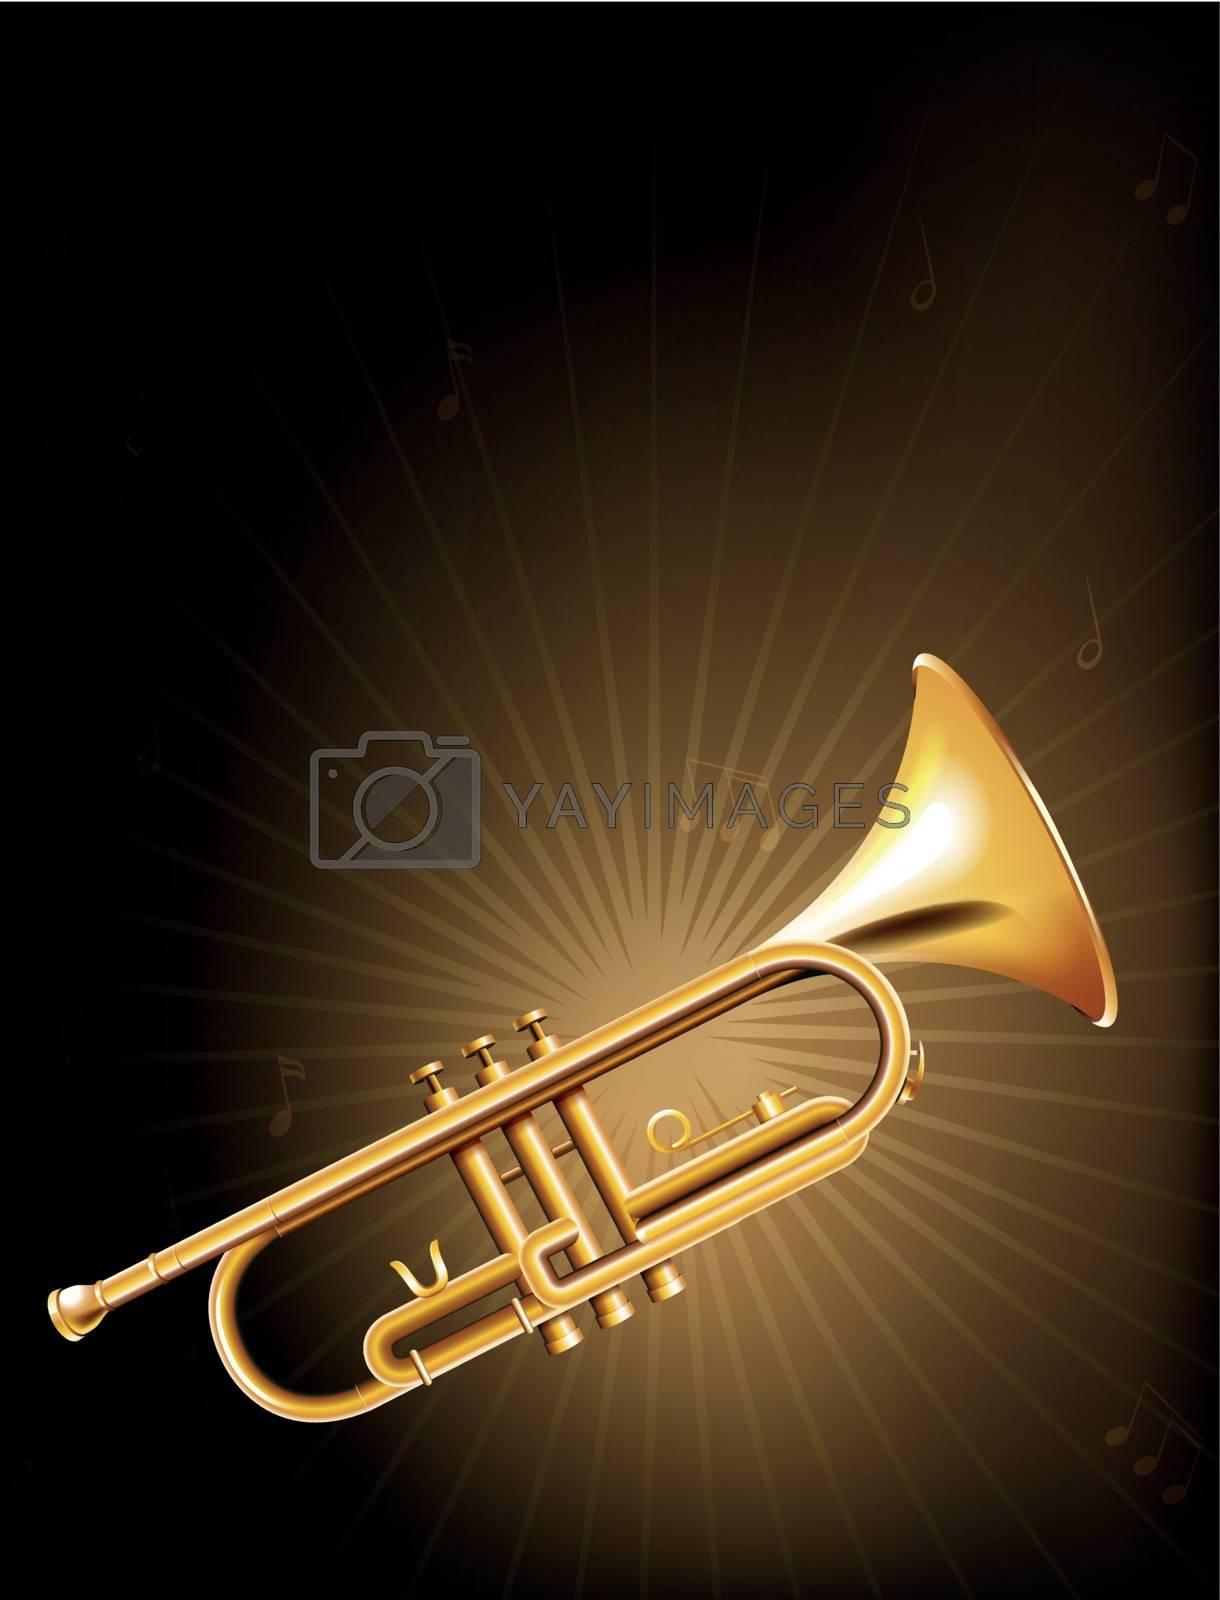 Illustration of a golden trumpet